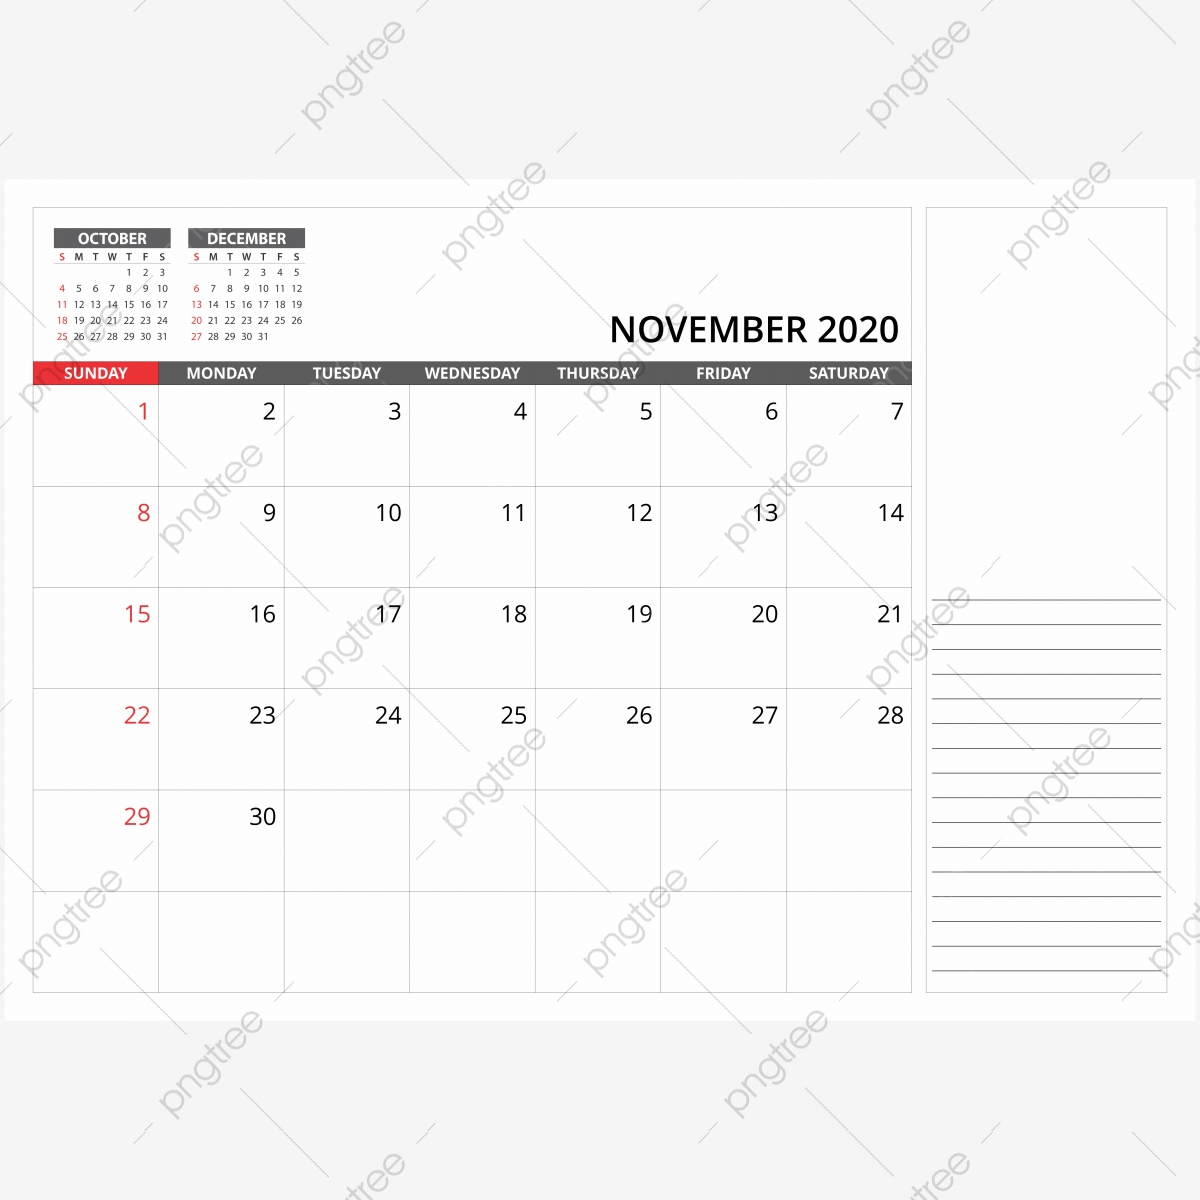 November 2020 Monthly Desk Calendar, 2020, Calendar, Png Png pertaining to November Calendar 2020 Transparent